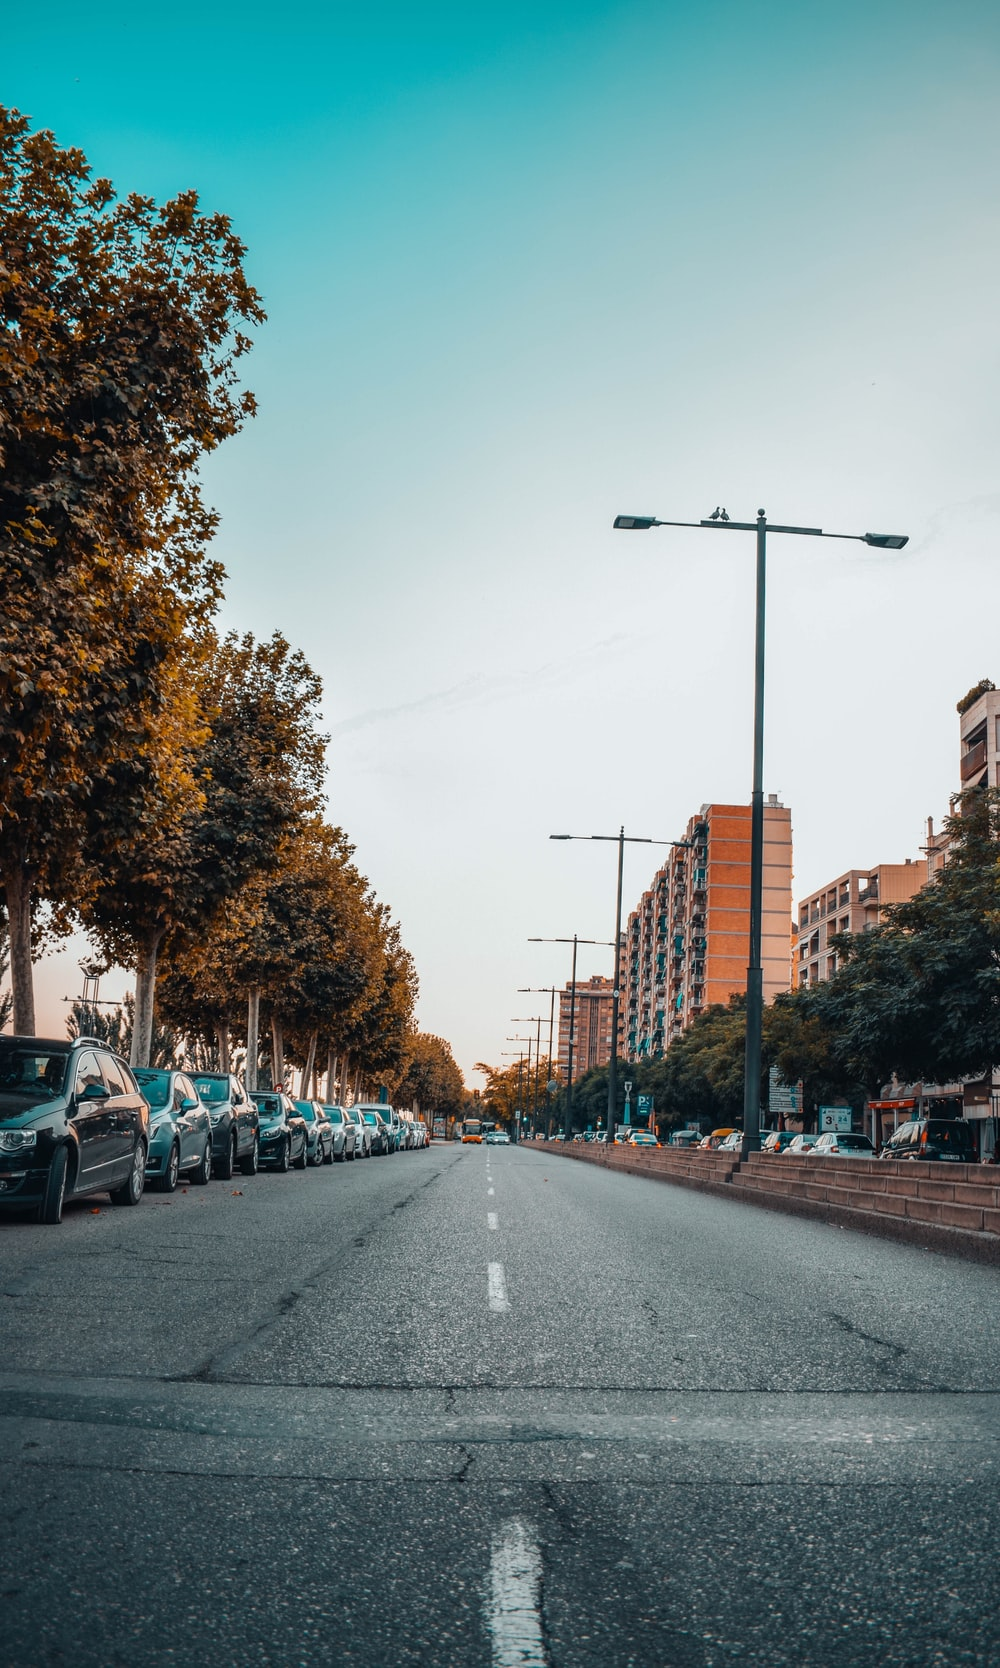 trees and building between asphalt road